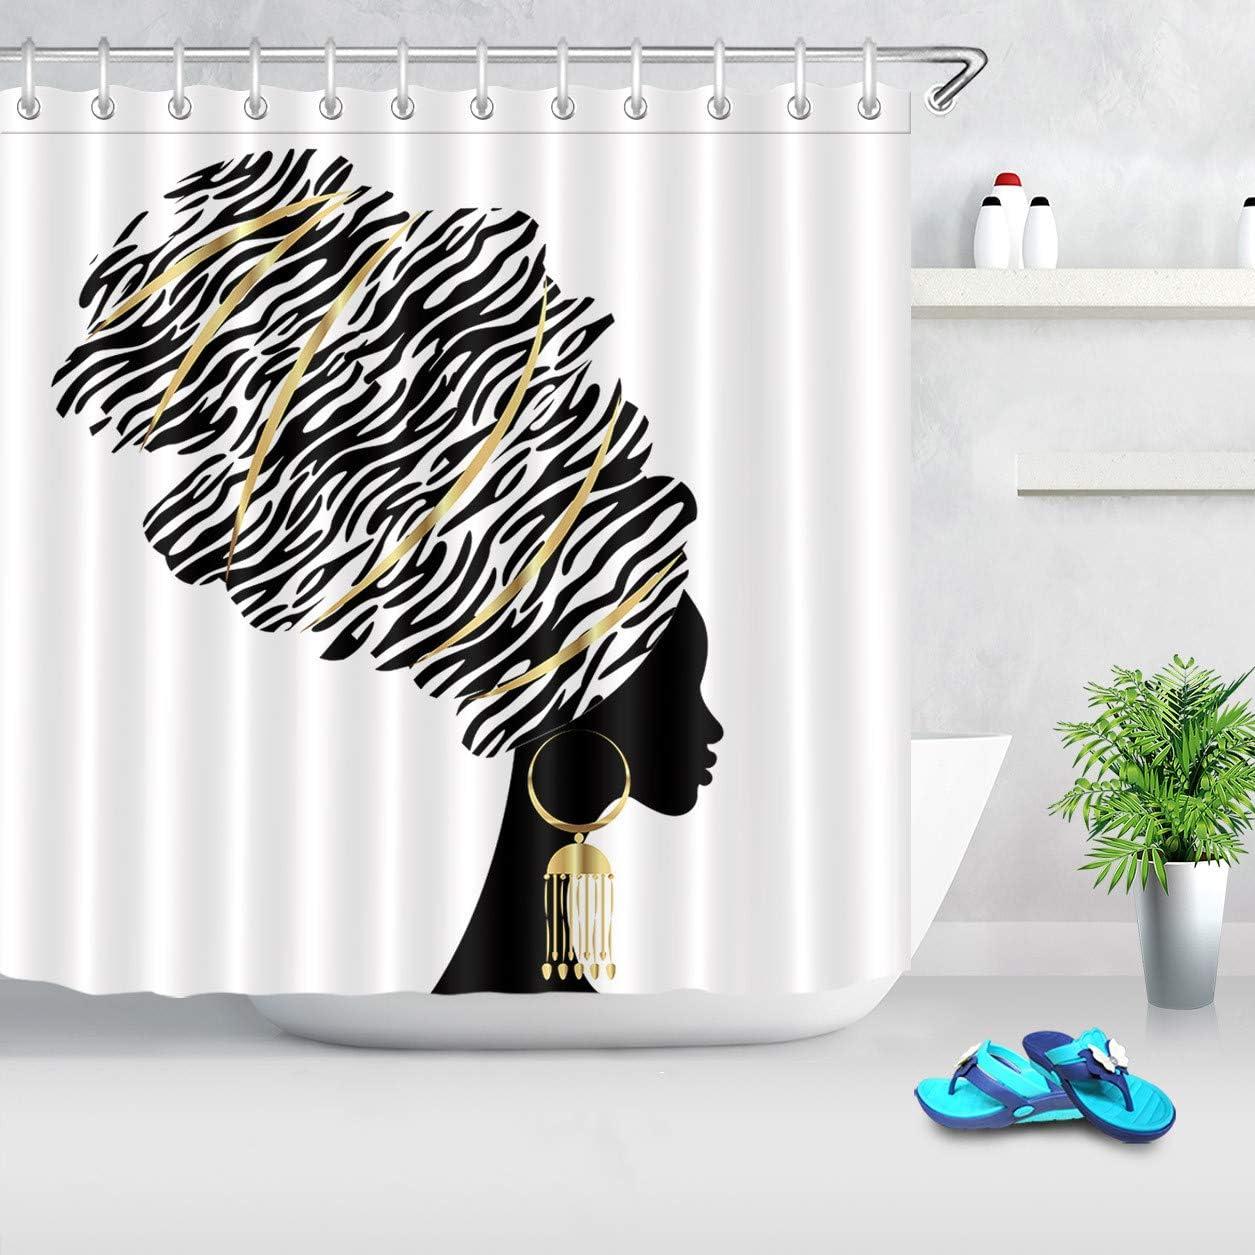 Waterproof Fabric Shower Curtain Hooks Beautiful African American Woman Pattern